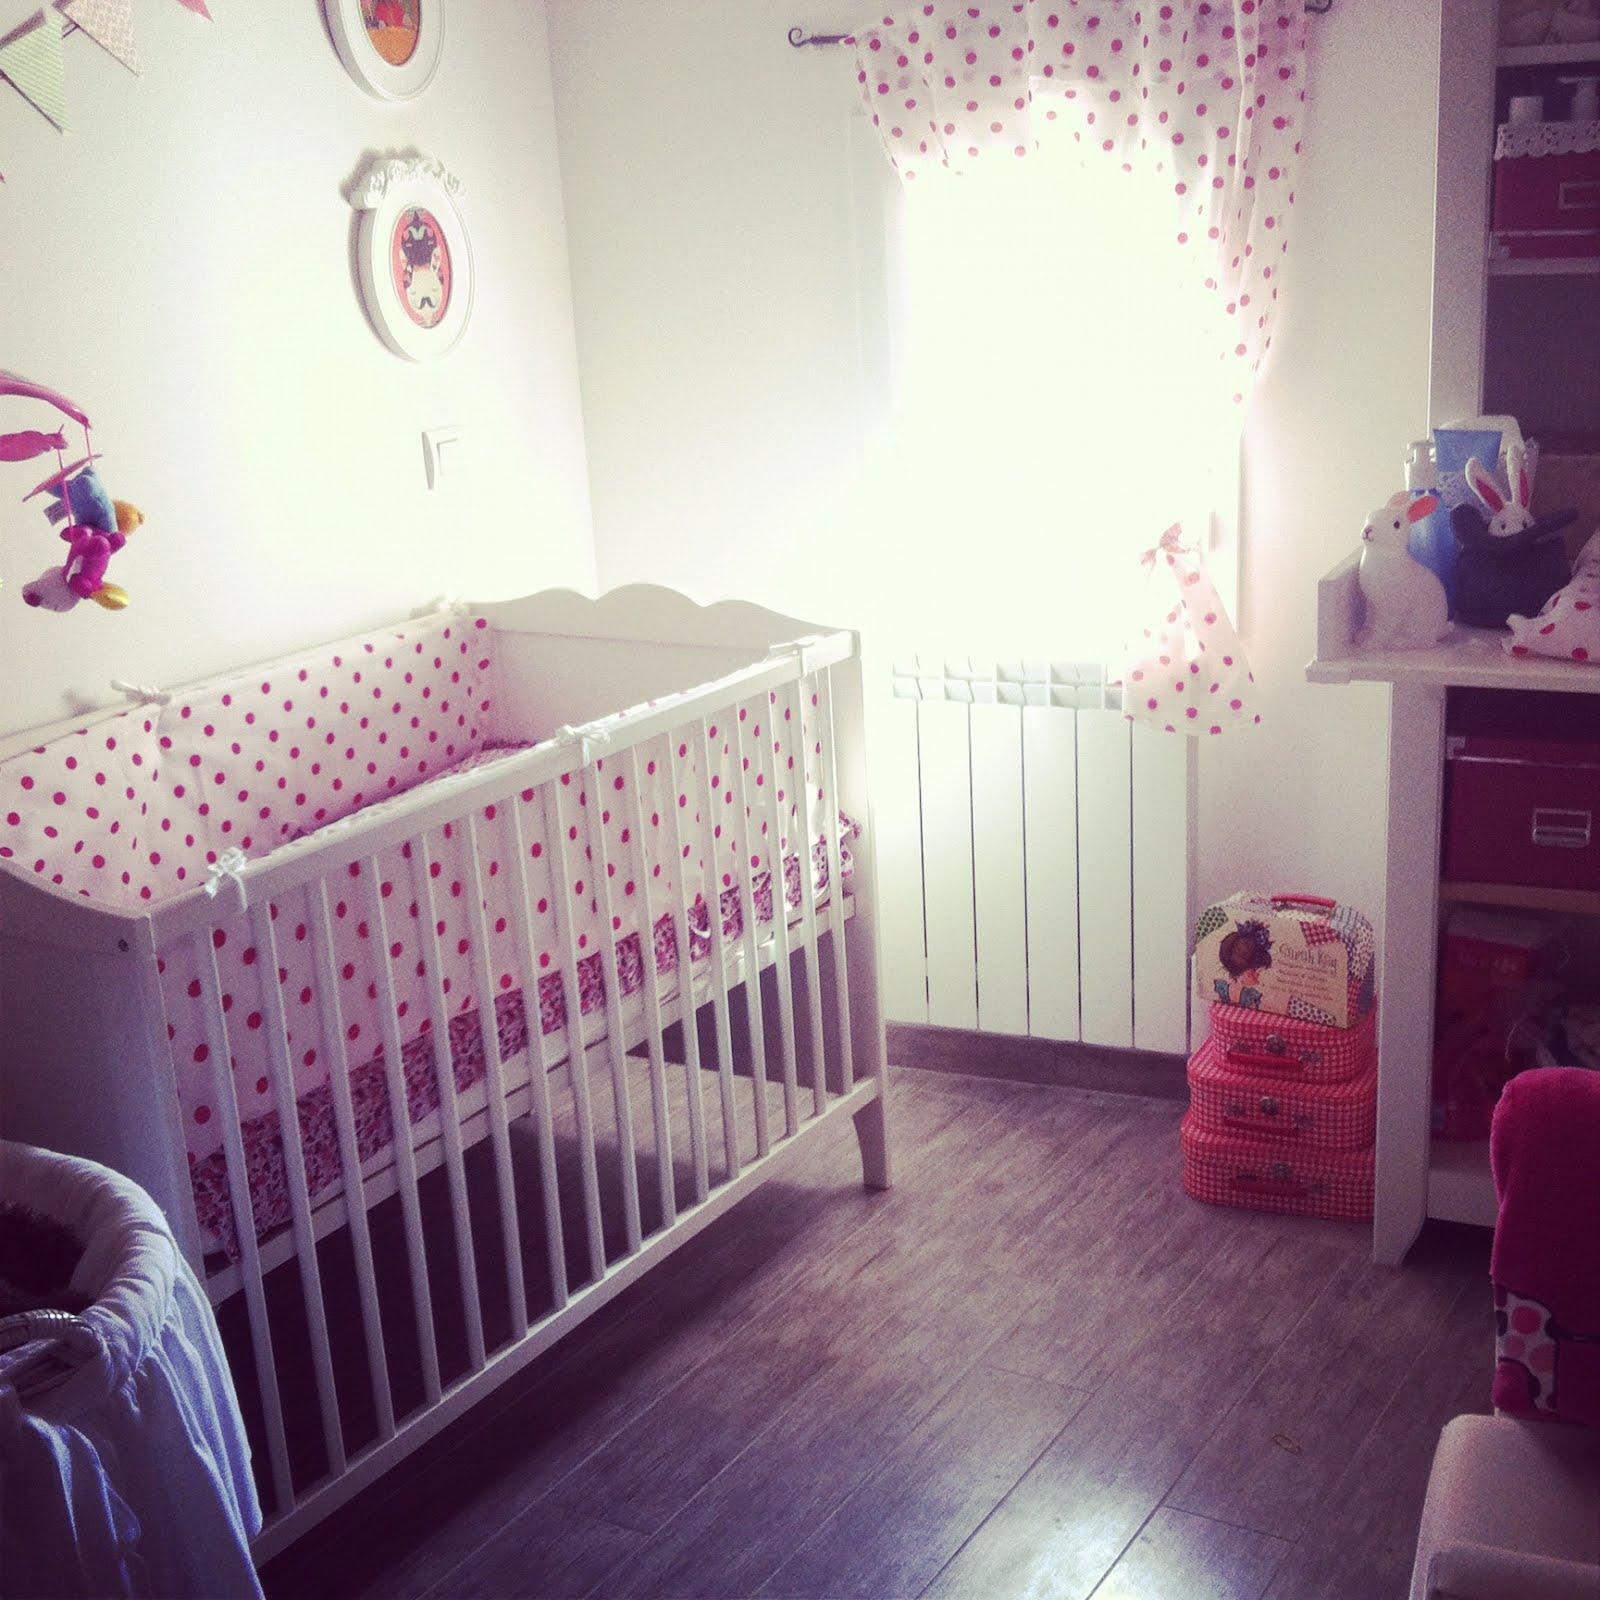 contour de lit ikea entourage de lit bebe entourage de lit bebe stupefiant tour de lit foxi. Black Bedroom Furniture Sets. Home Design Ideas